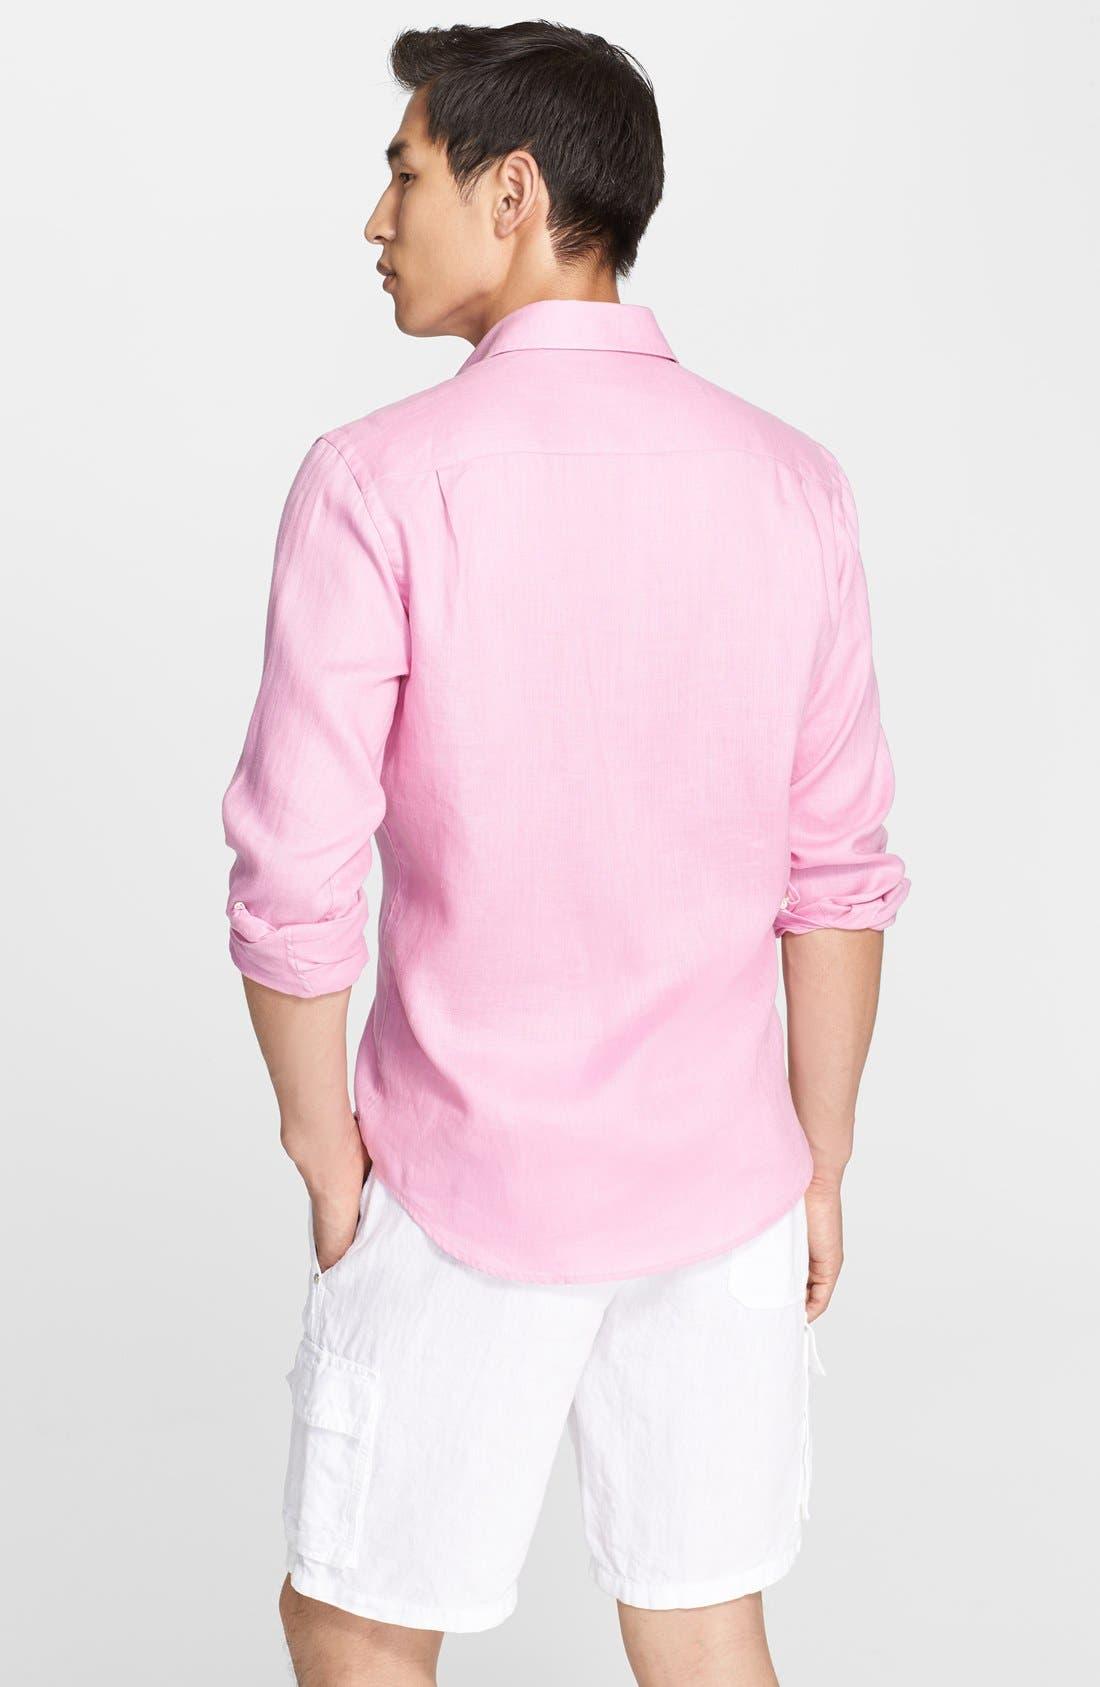 'Caroubier' Linen Shirt,                             Alternate thumbnail 30, color,